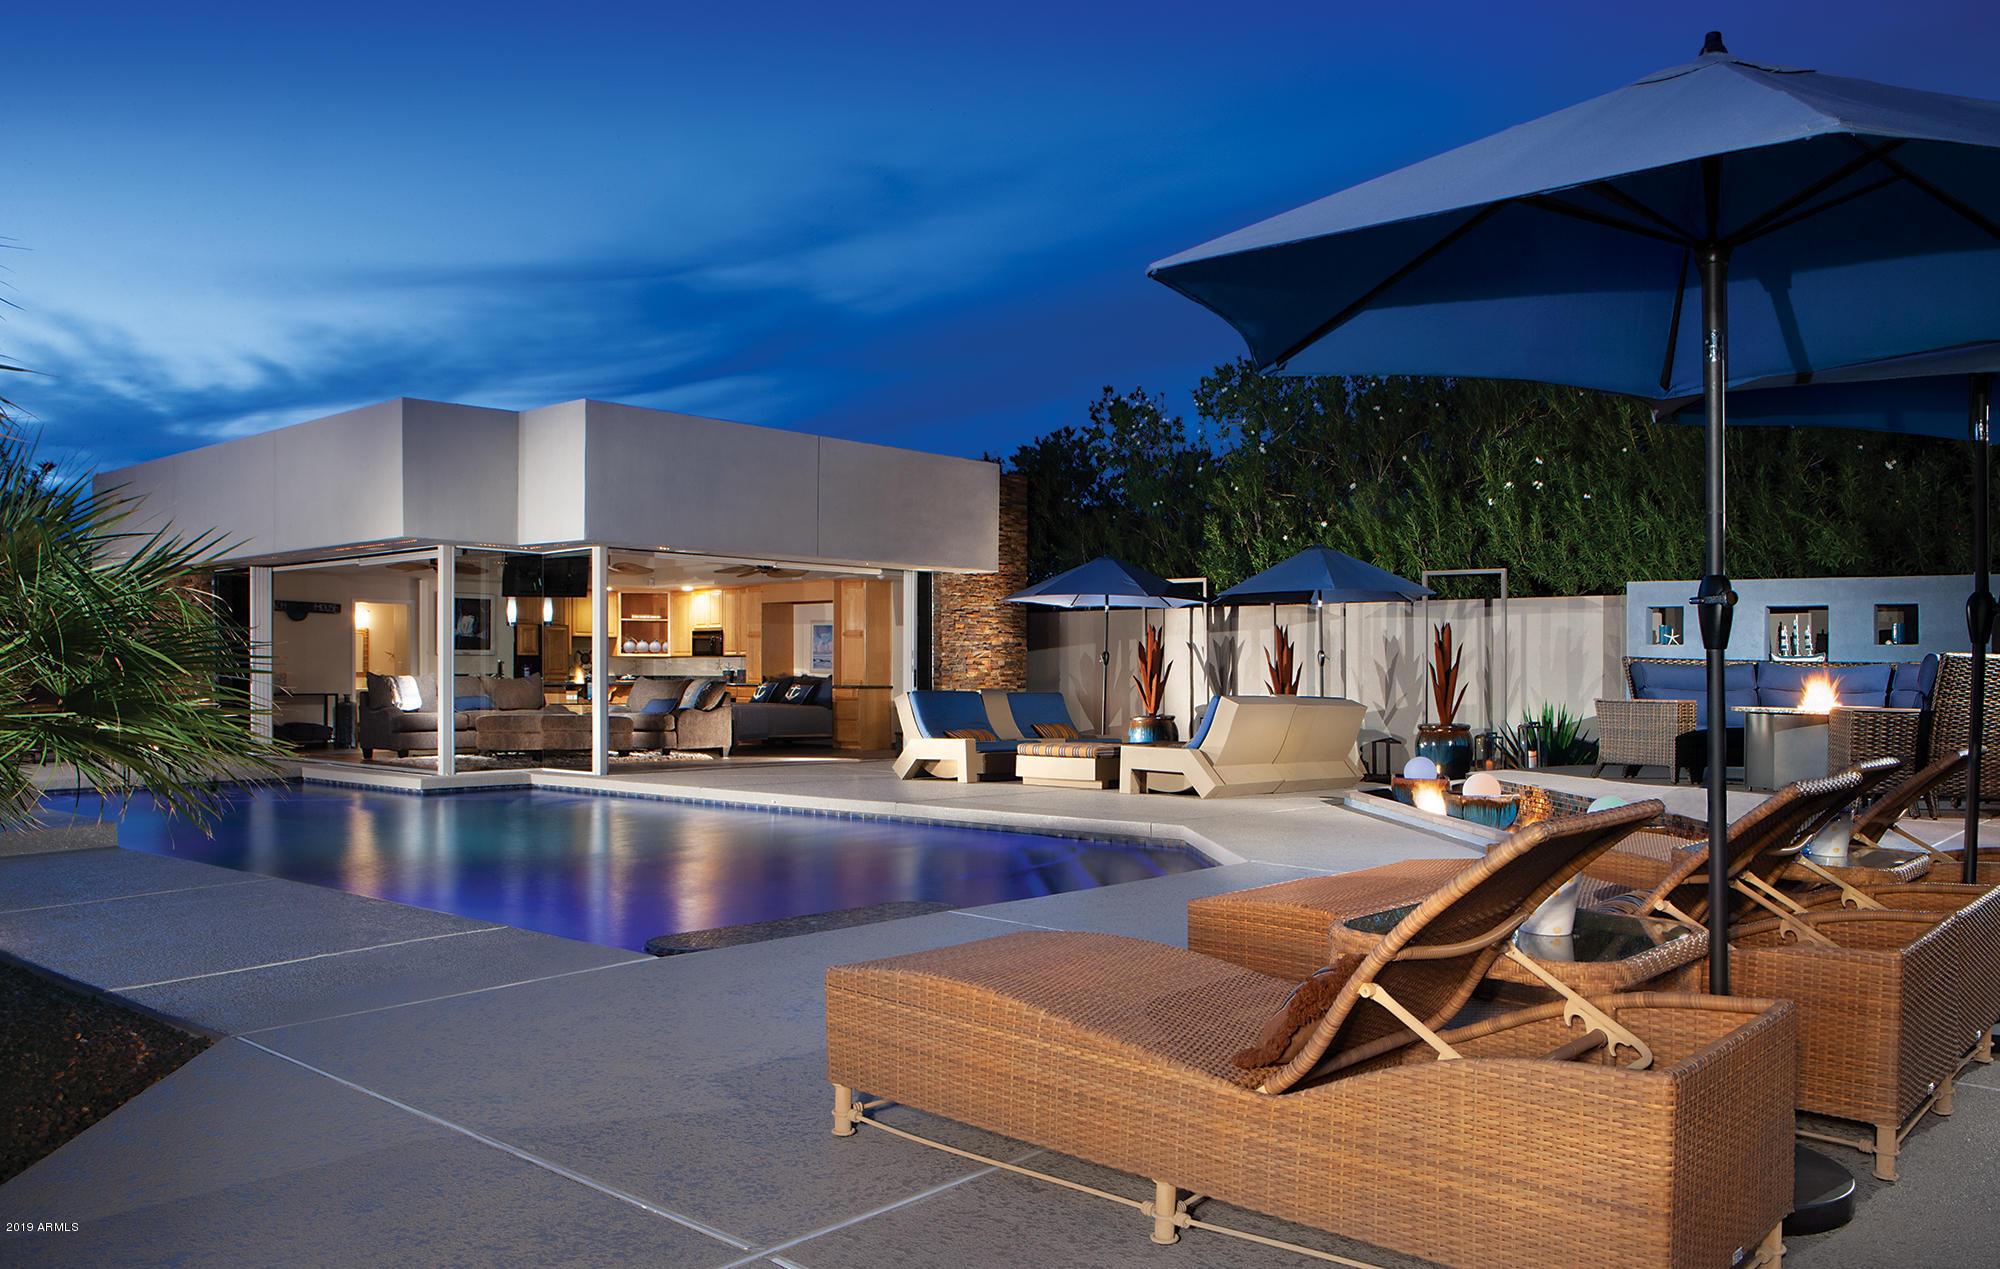 MLS 5933133 5220 E CHOLLA Street, Scottsdale, AZ 85254 Scottsdale AZ Private Pool